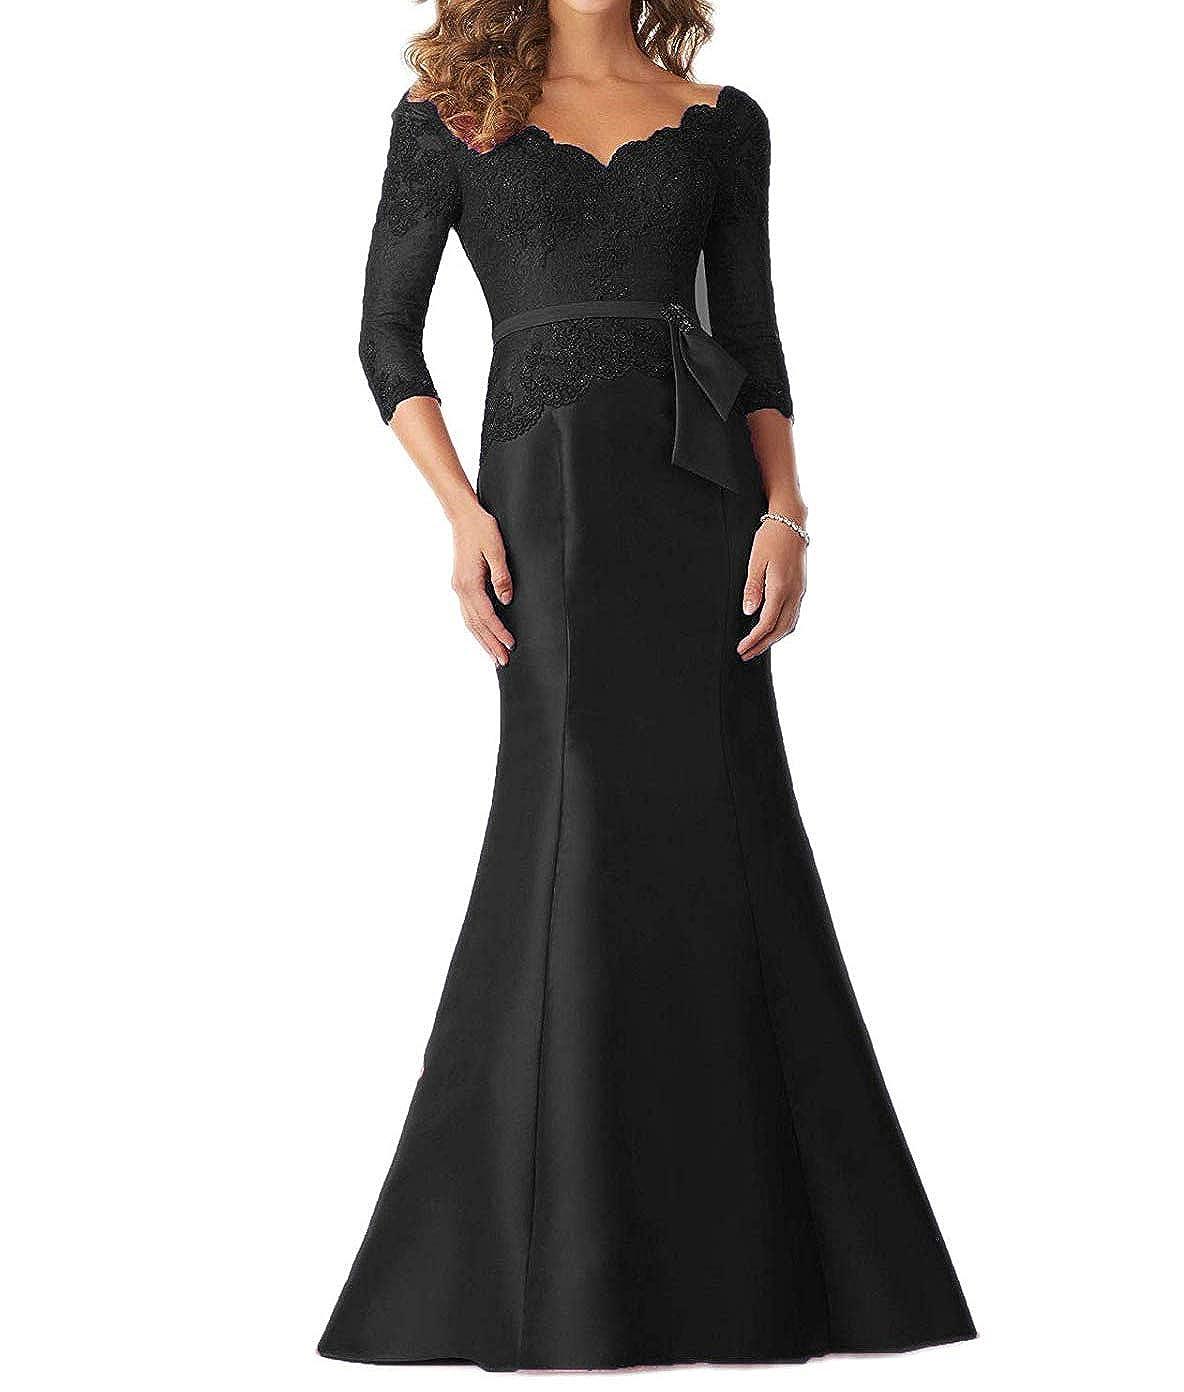 Black tutu.vivi Women's VNeck Lace Mermaid Evening Prom Dresses 3 4 Sleeves Appliques Long Formal Gown